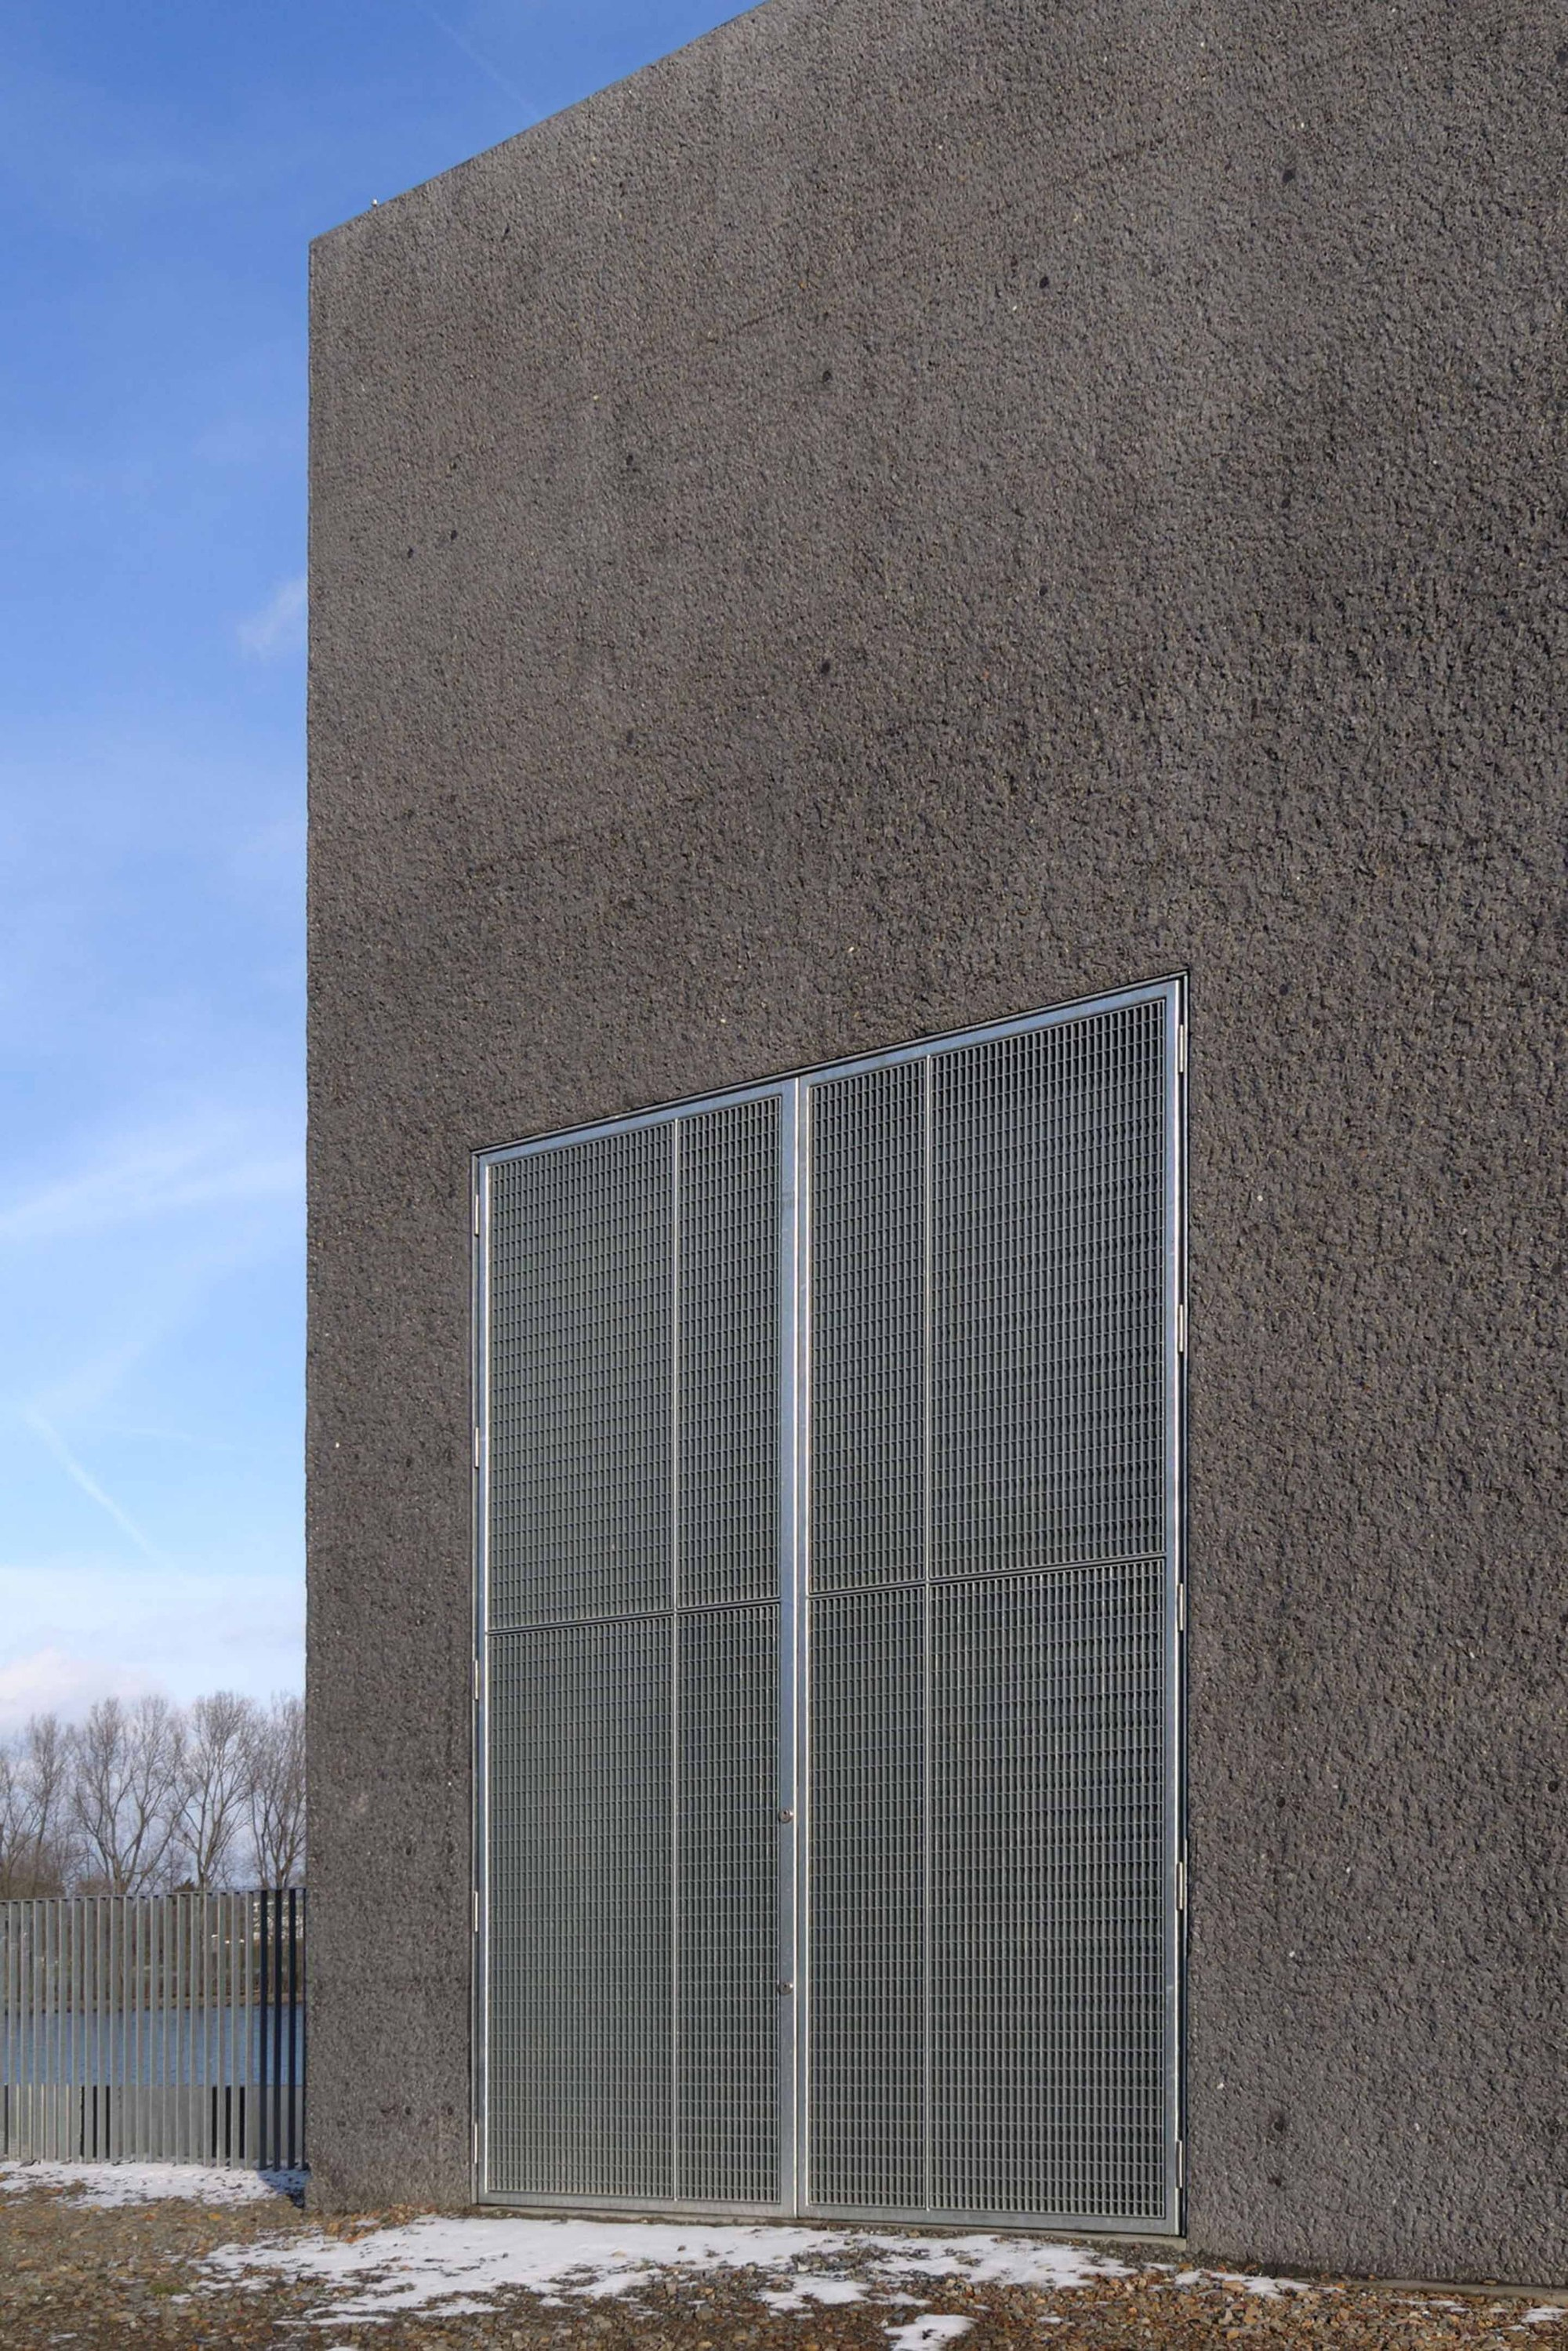 Architekt Mainz gallery of pumping station mainz syra schoyerer architekten 7